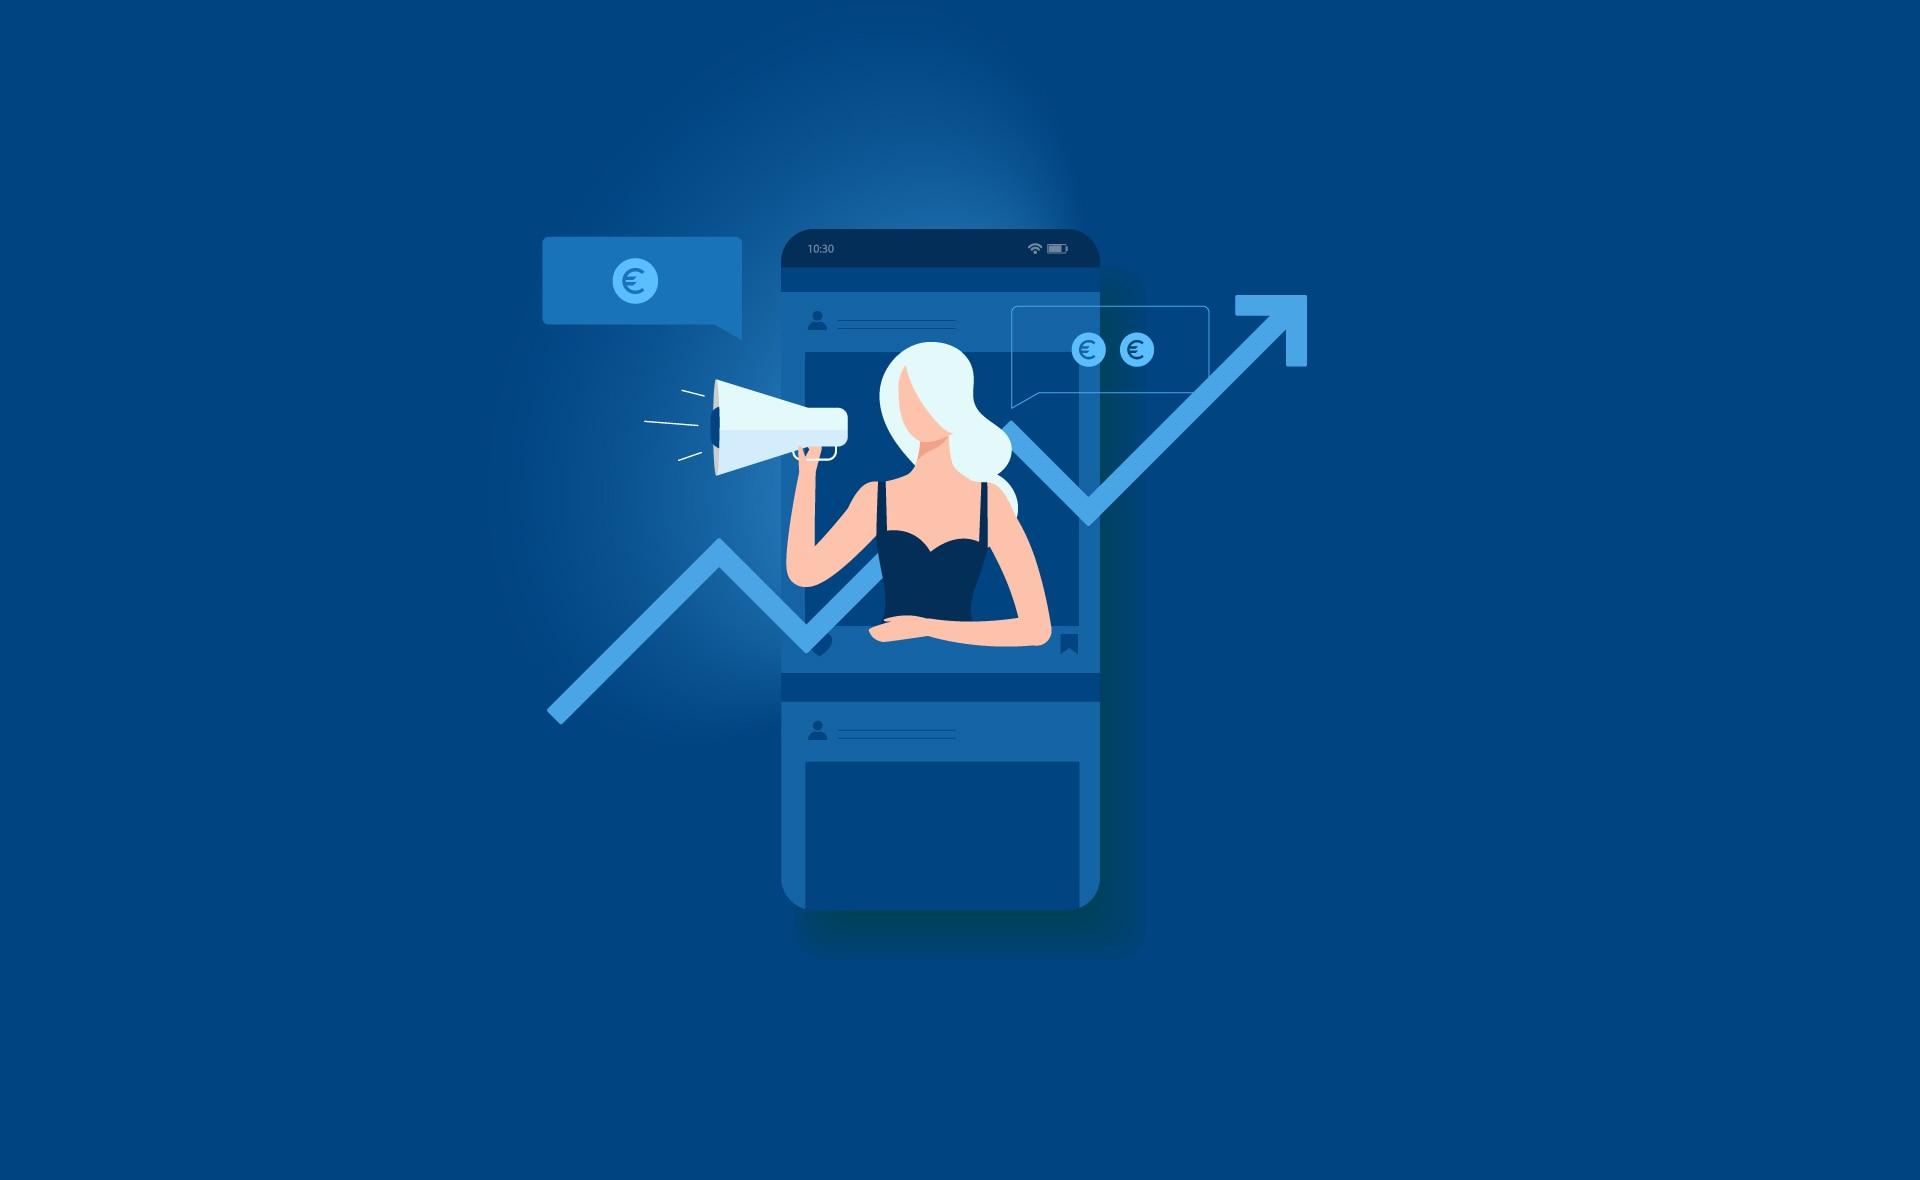 BBVA-Finfluencers-finanzas-innovacion-tecnologia-influencers-redes-sociales.jpgG